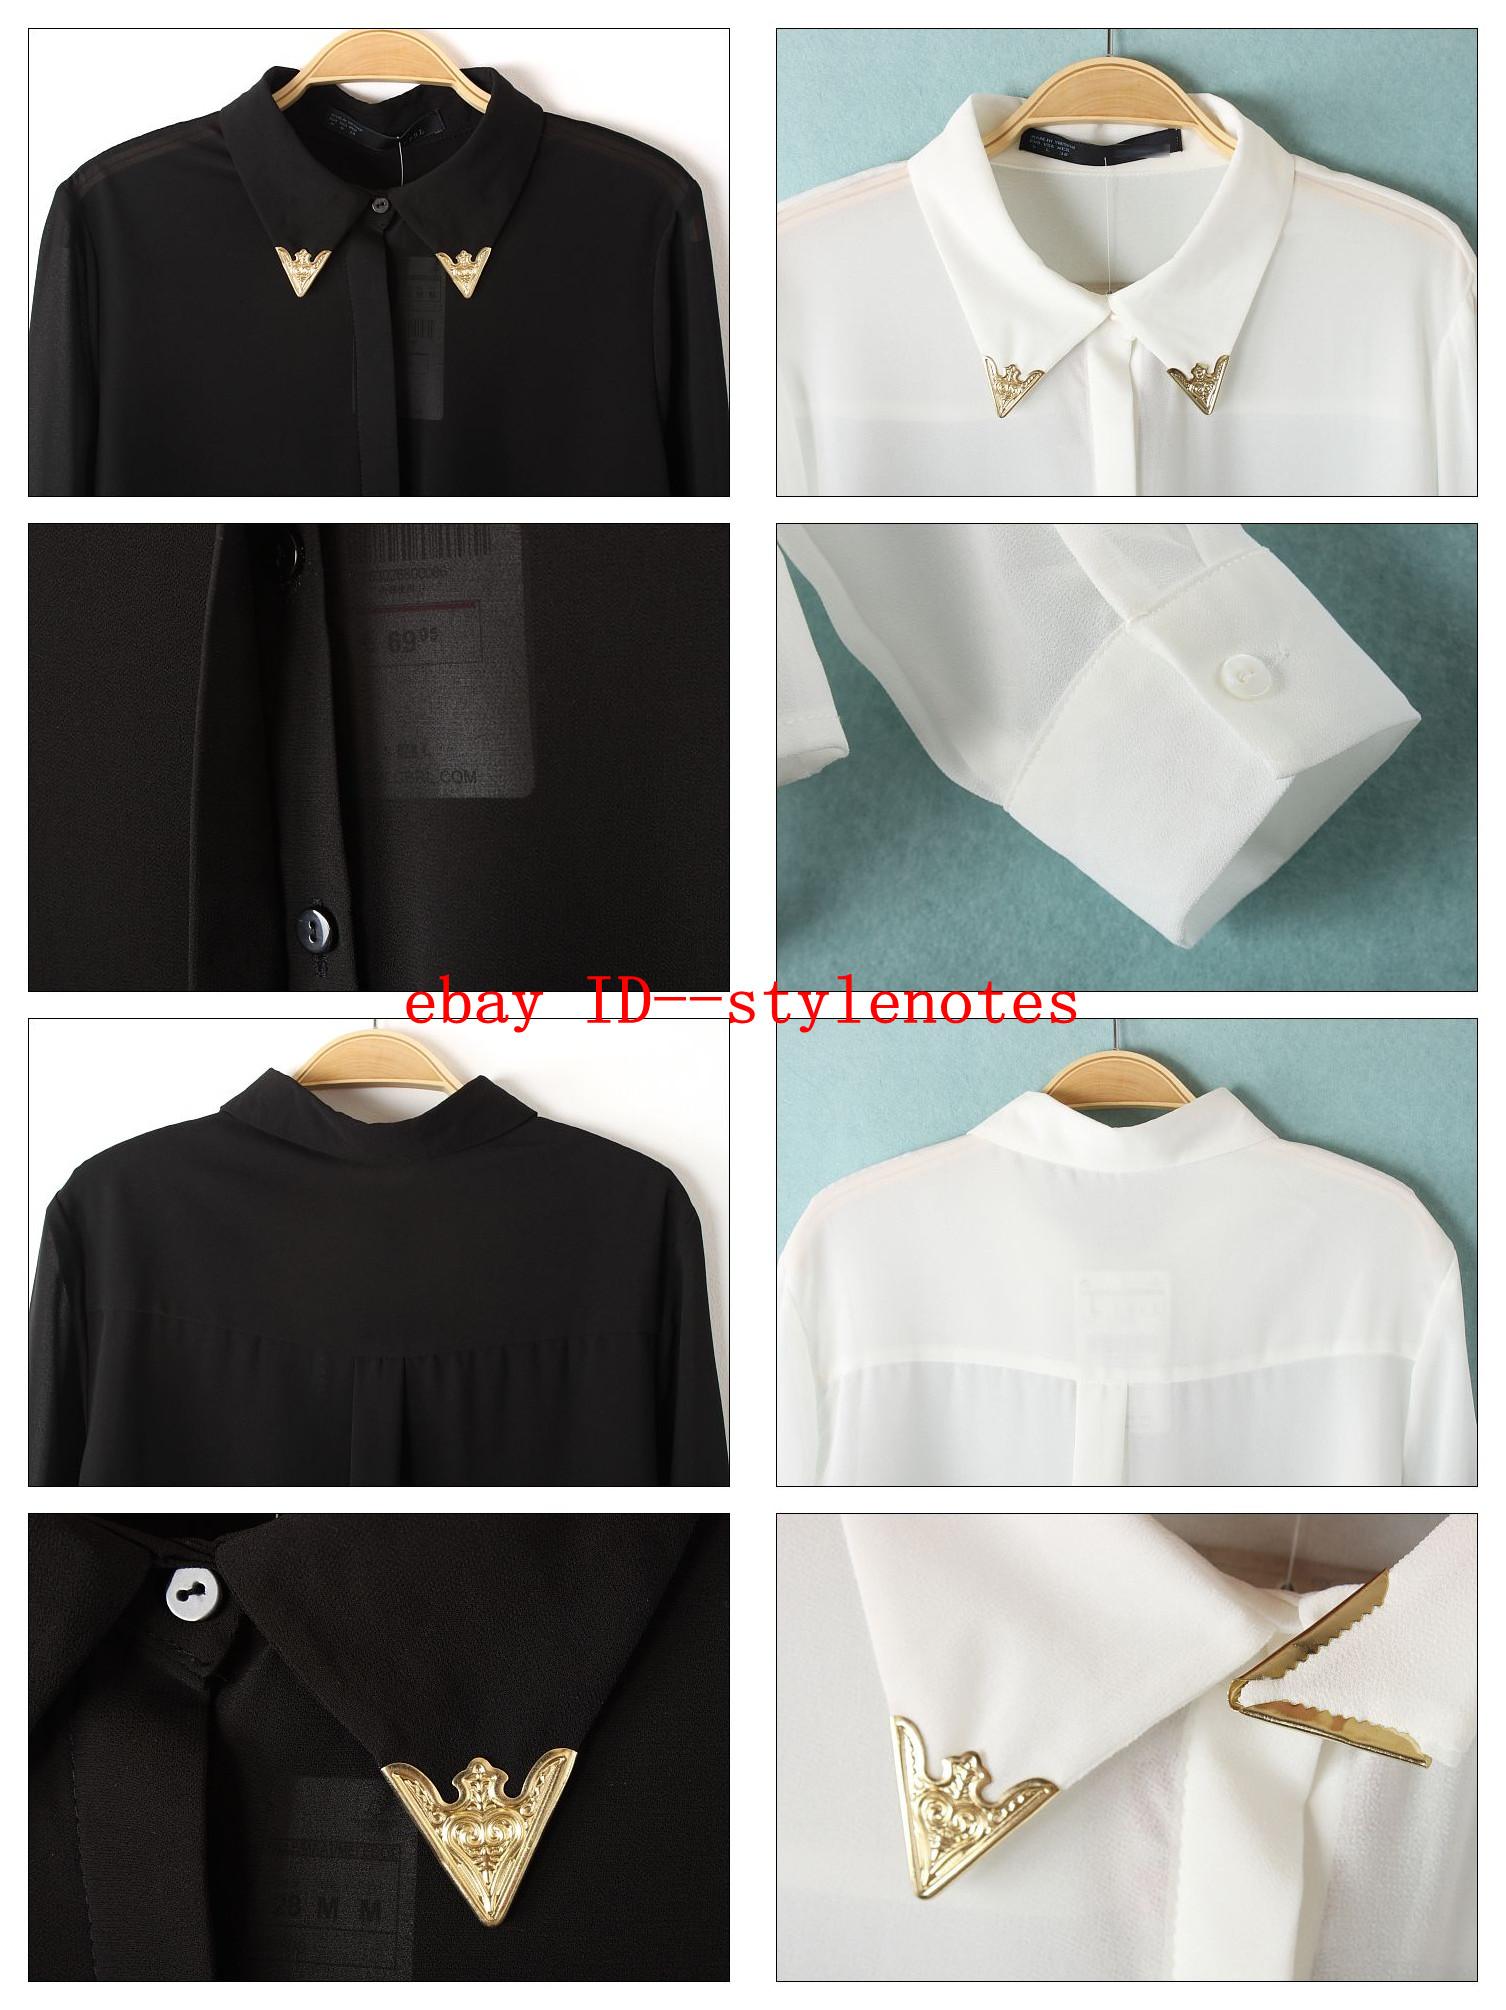 Semi Sheer Lightweight Metal Tips Classic Point Collar Long Sleeved Blouse Shirt | eBay